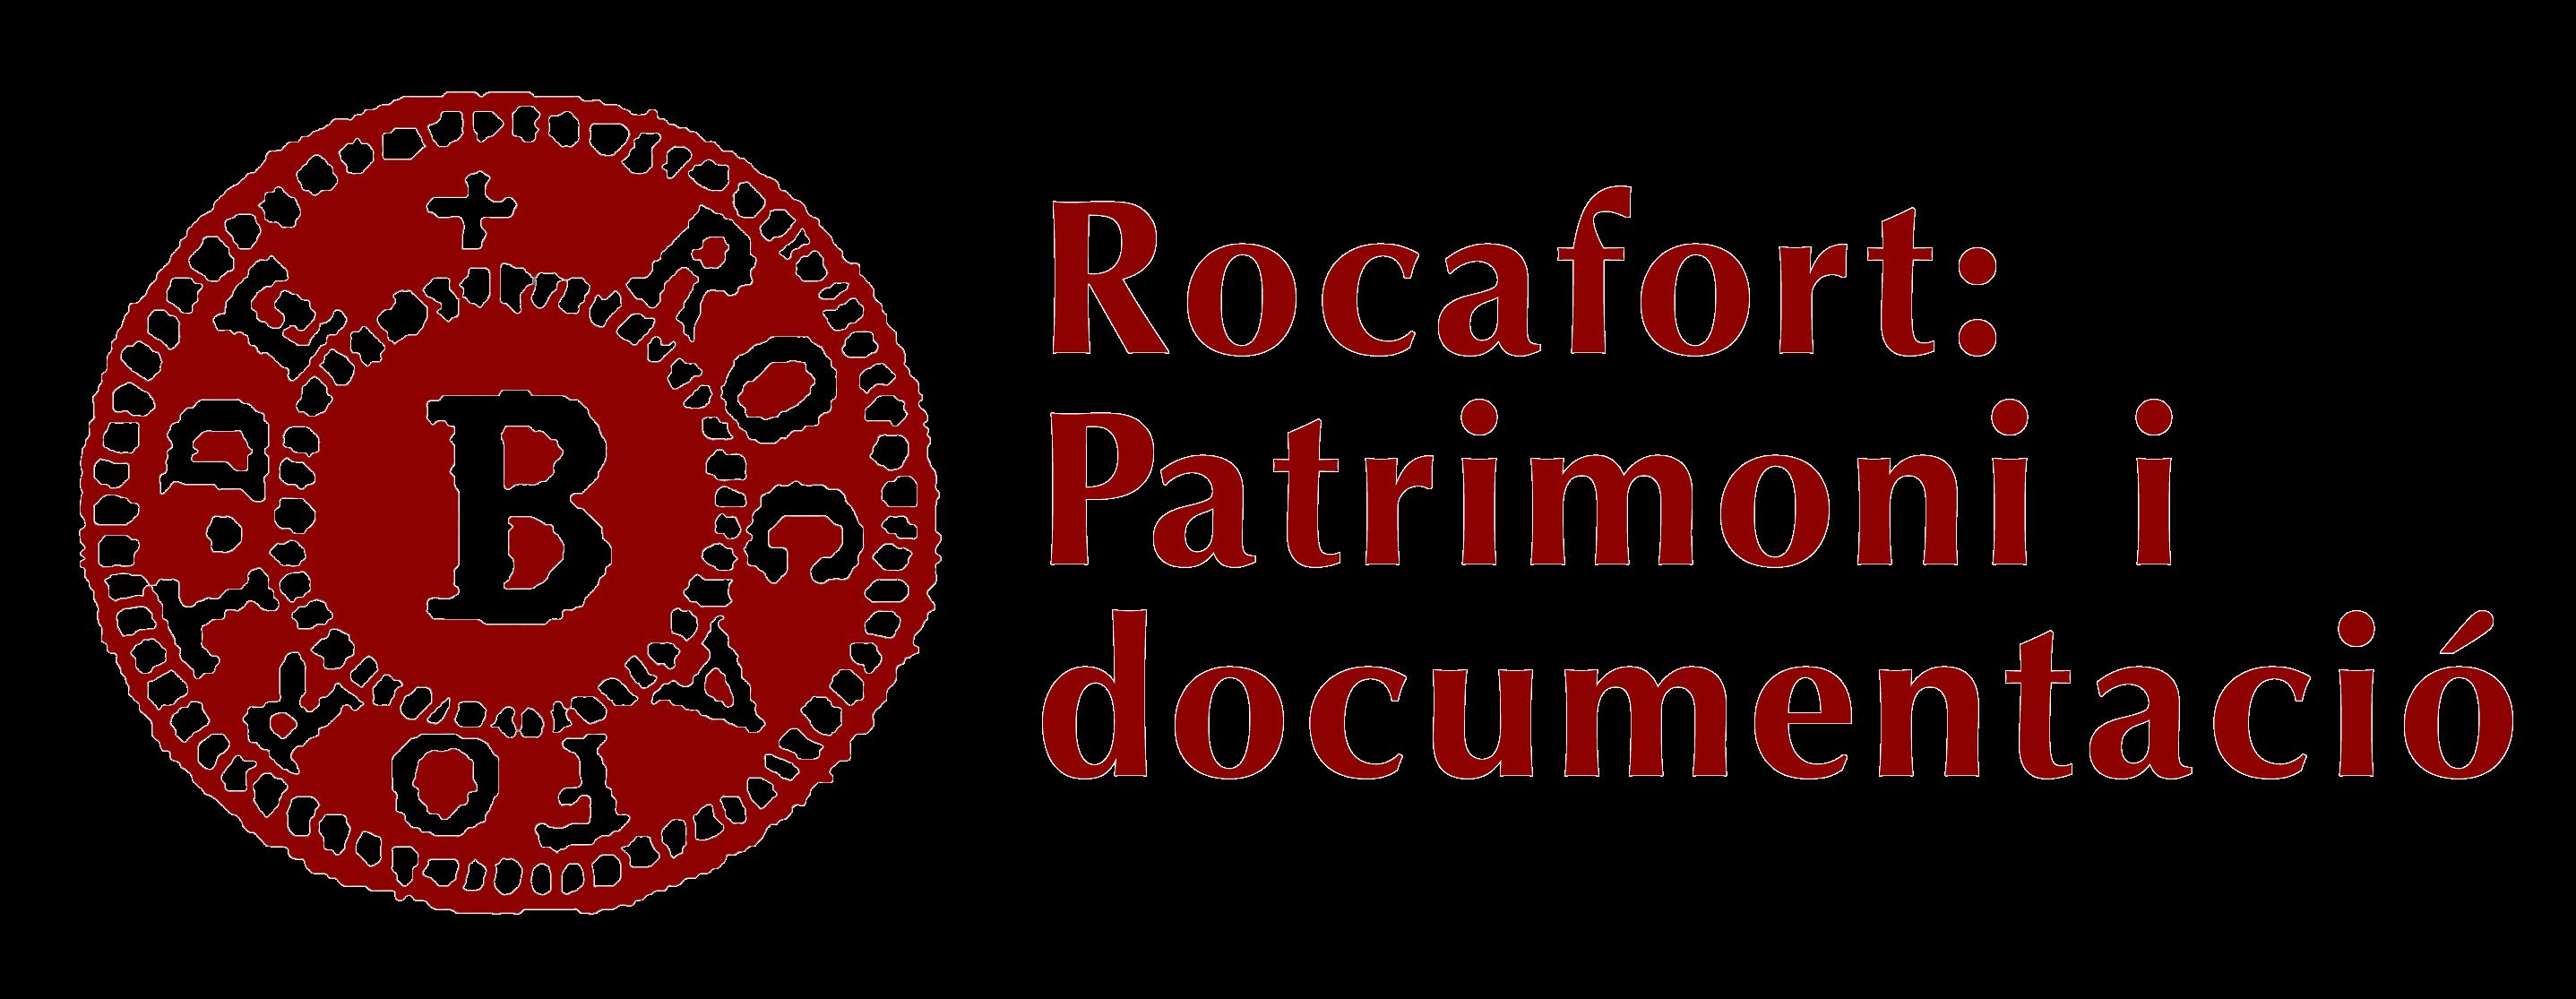 Rocafort pd